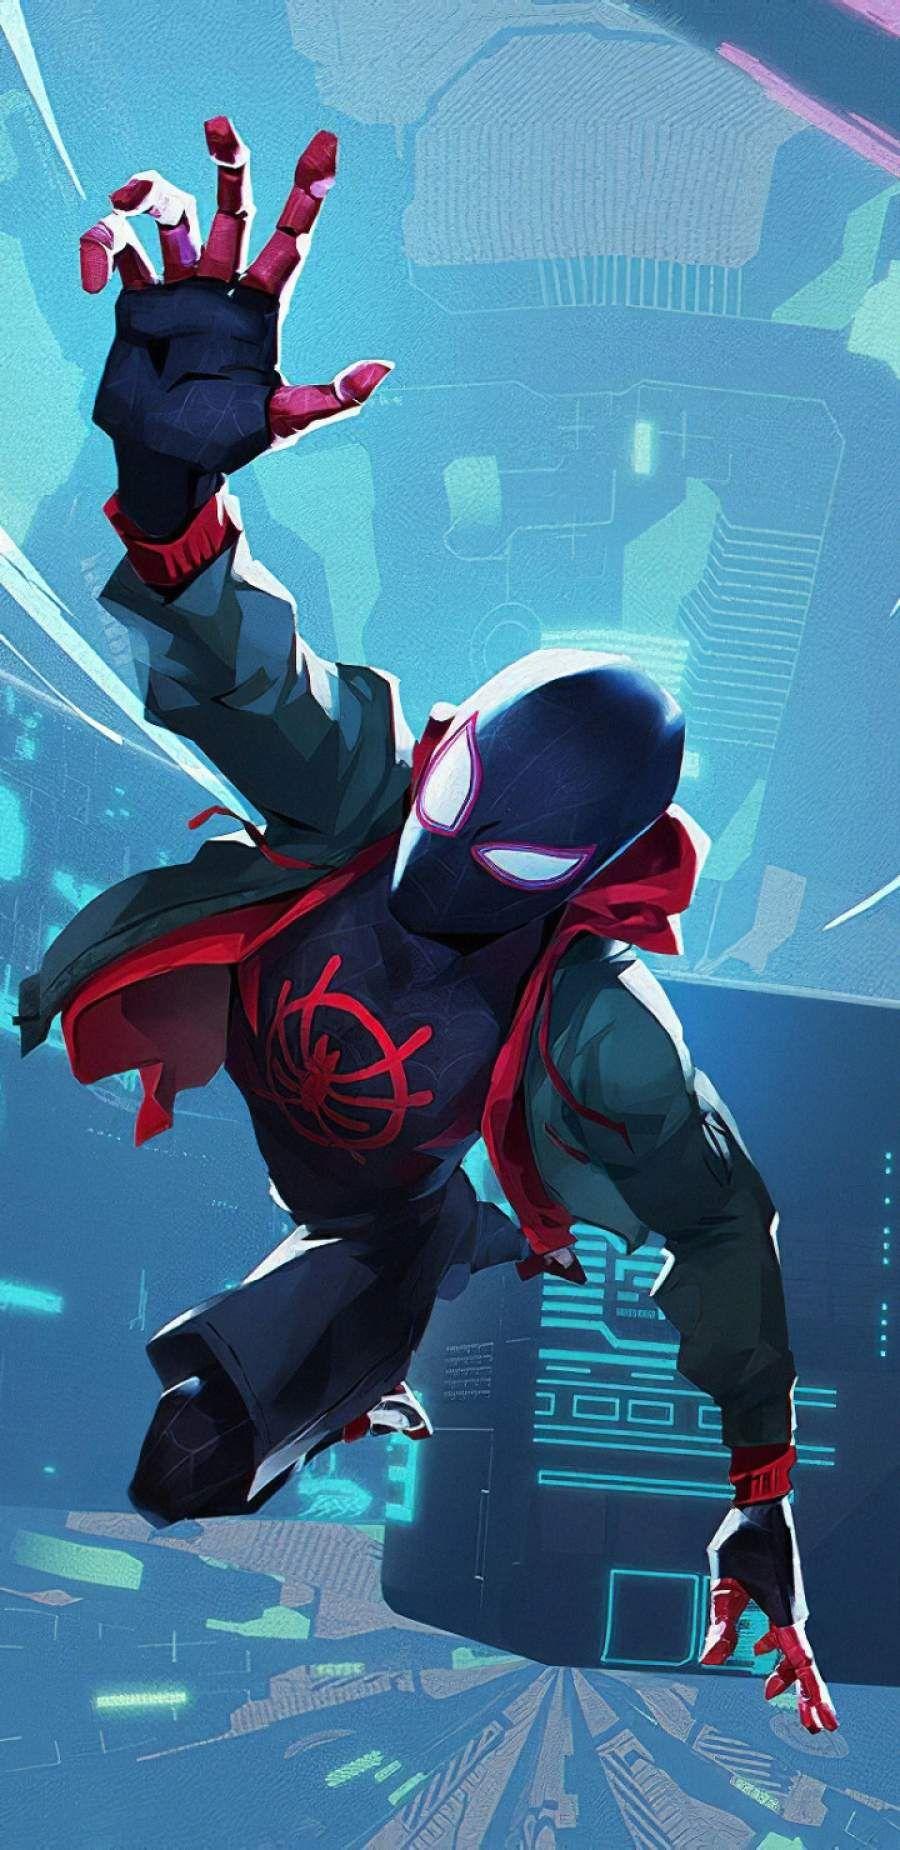 Spiderman Miles IPhone Wallpaper - IPhone Wallpapers